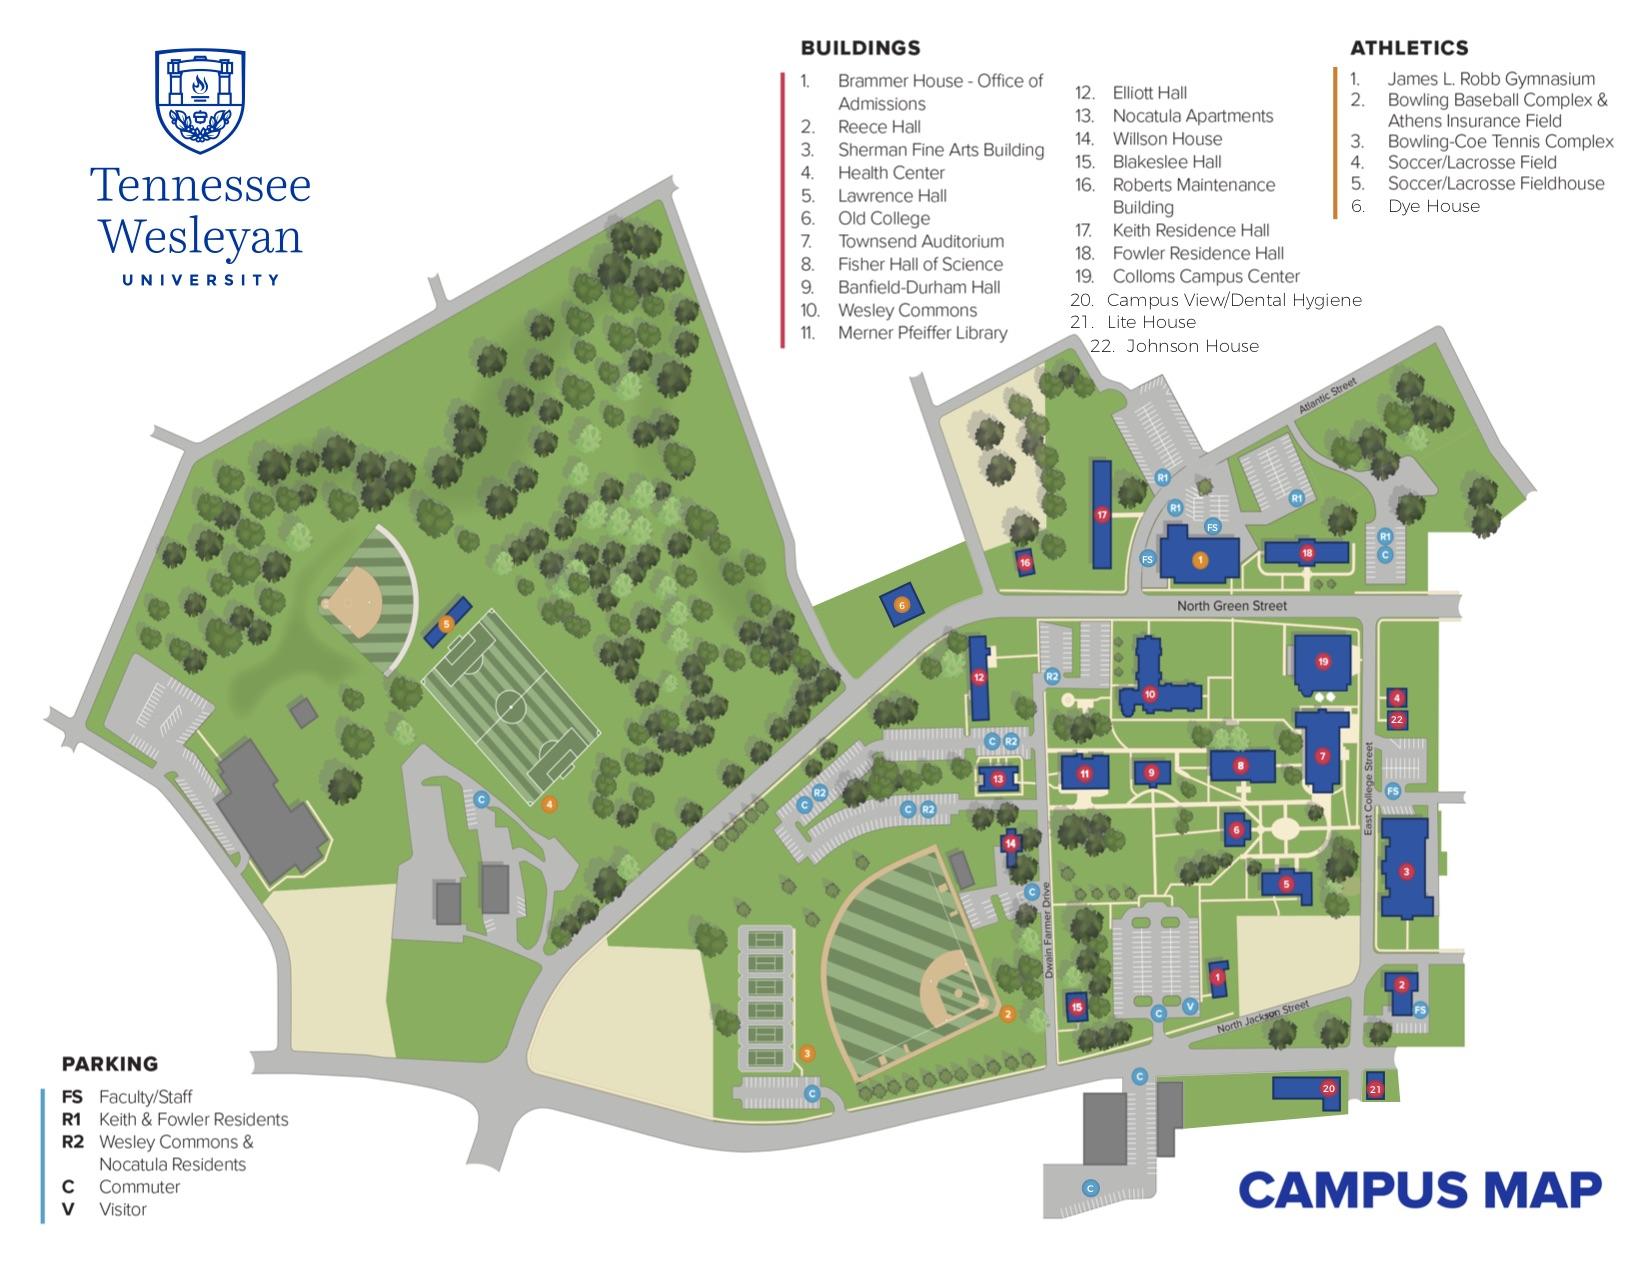 pfeiffer university campus map Location pfeiffer university campus map